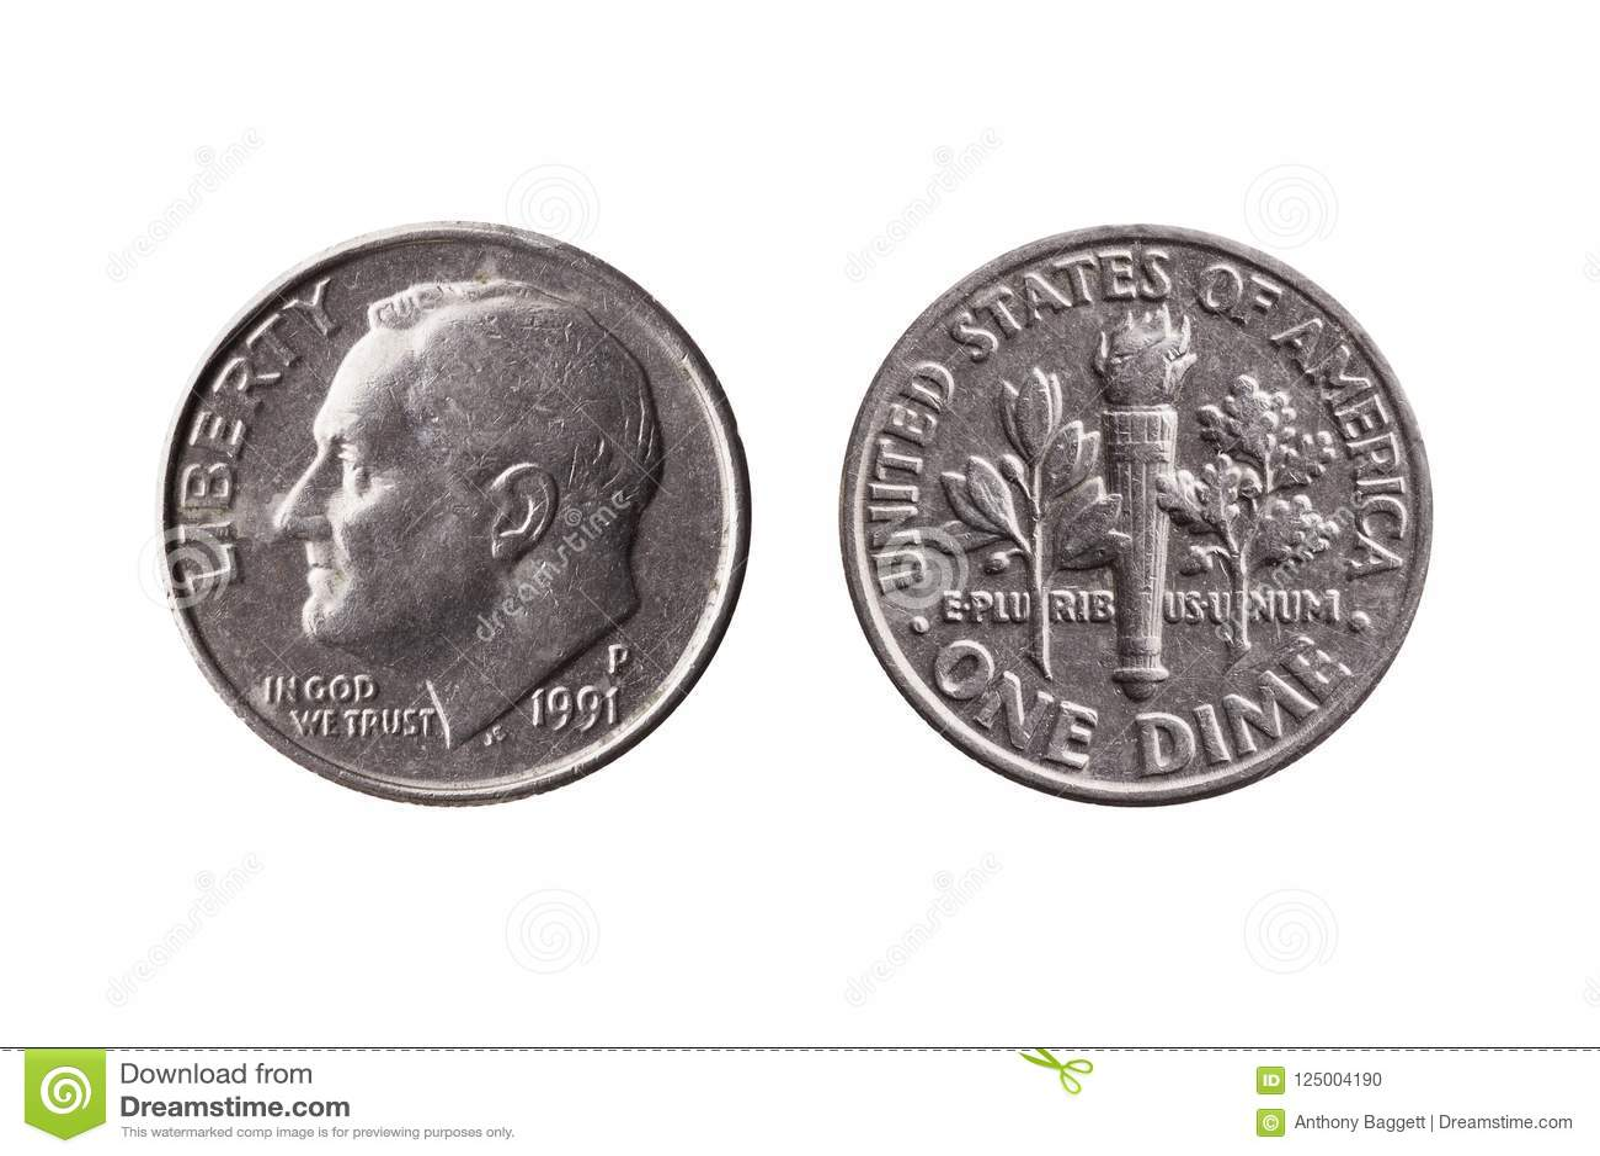 USA dime coin 10 cents obverse Franklin D Roosevelt